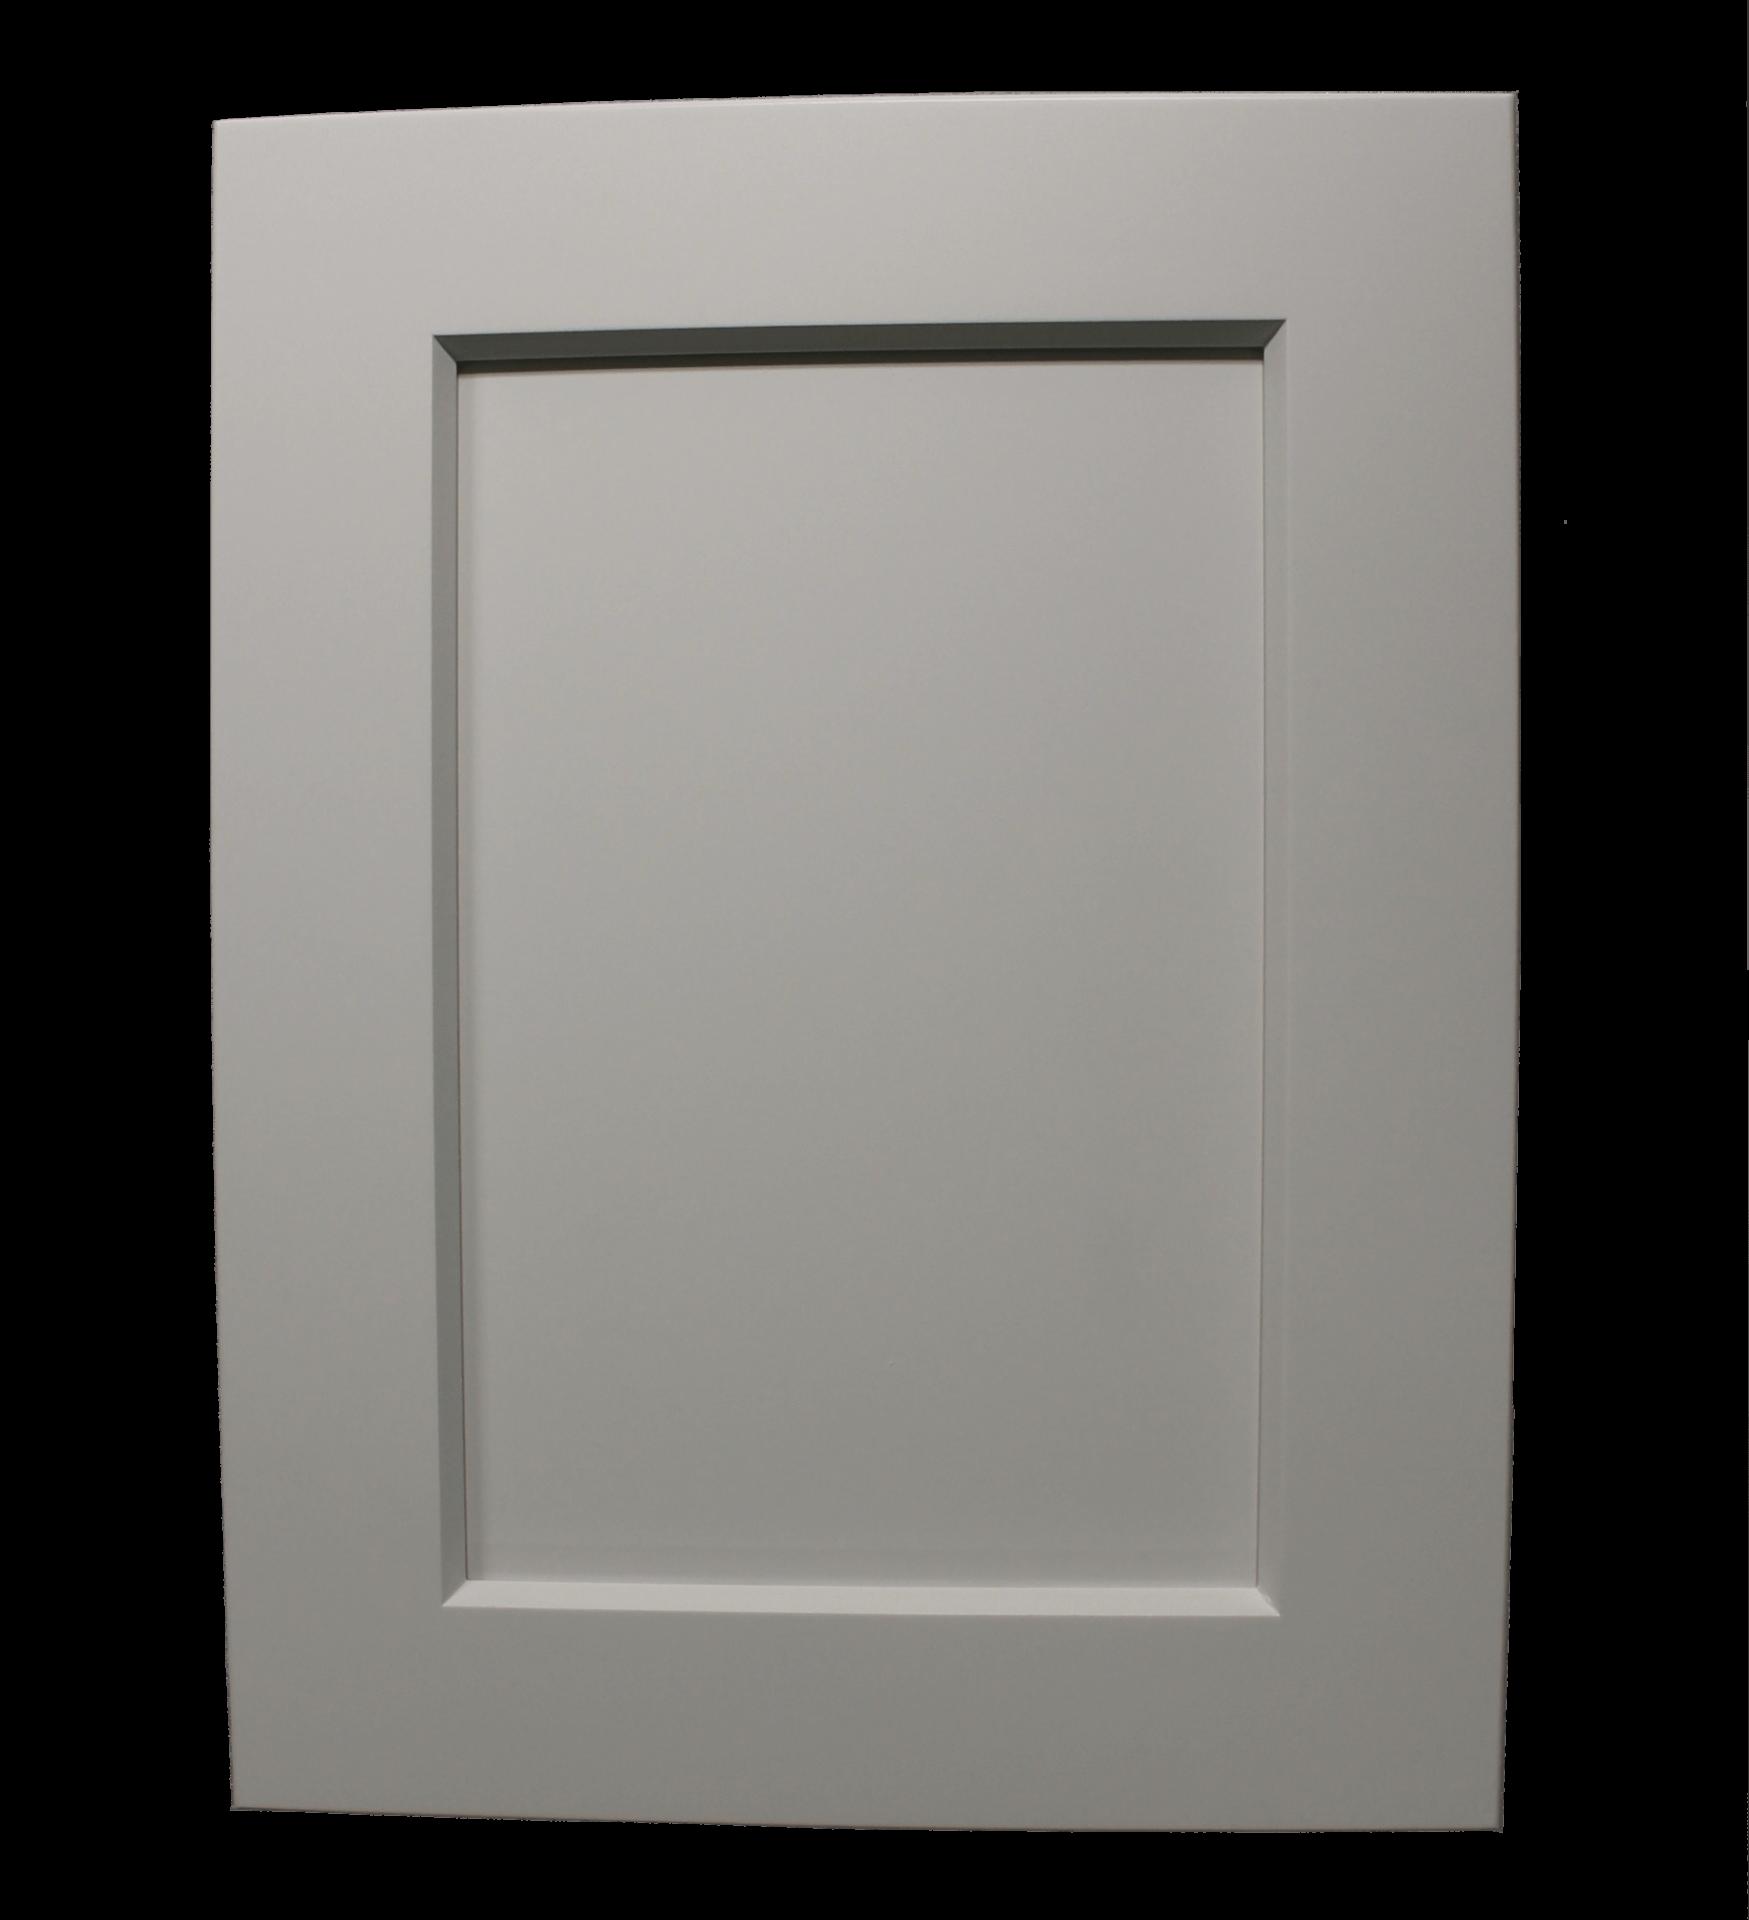 Flat_Panel__R-500_Inside_Edge__1-16_RO_Outside_Edge__(_Ice_Field_)